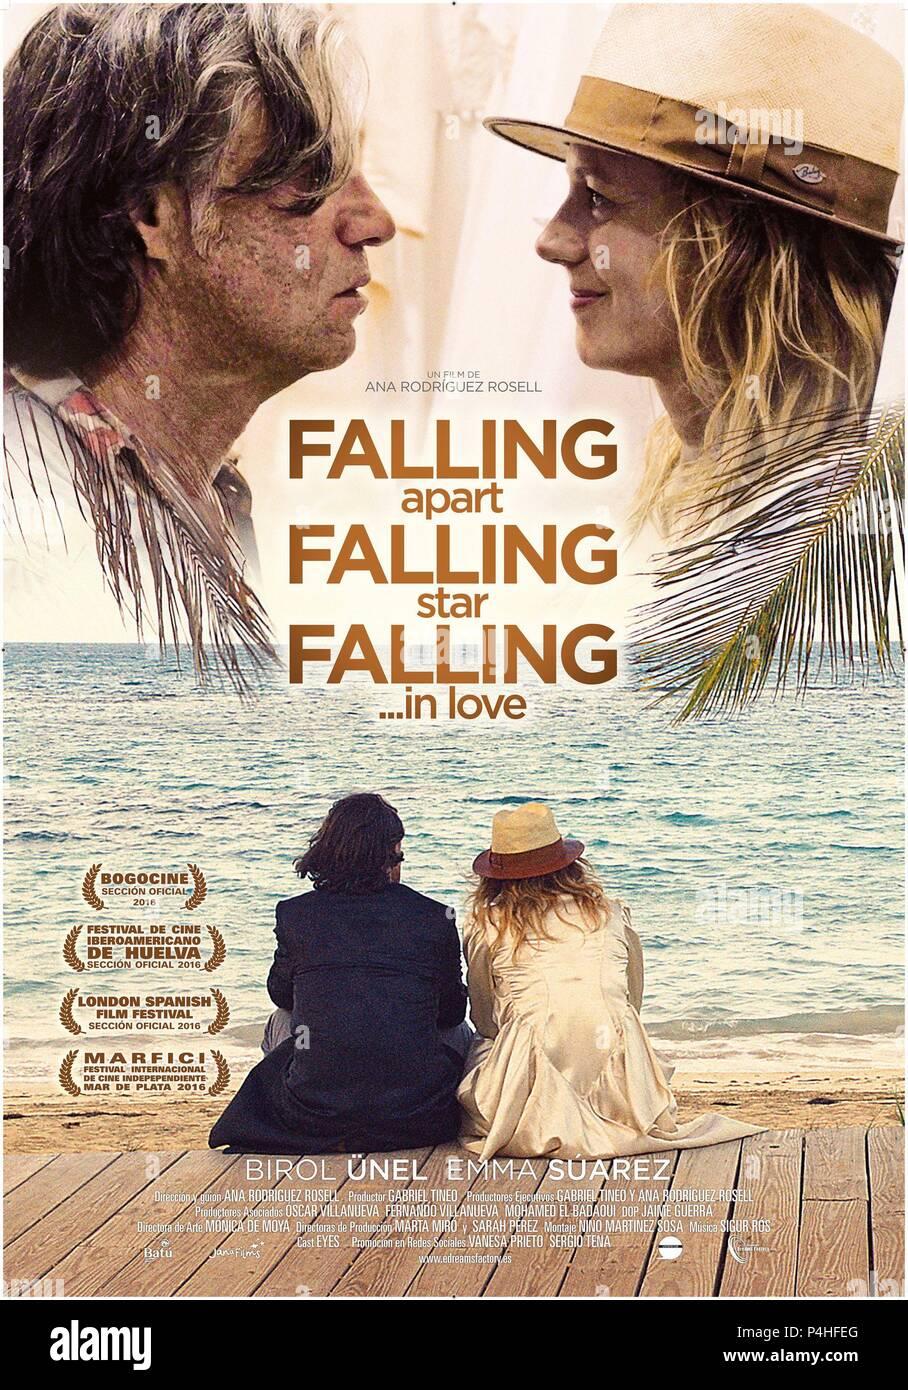 In Arte Nino 2016 original film title: falling. english title: falling. film